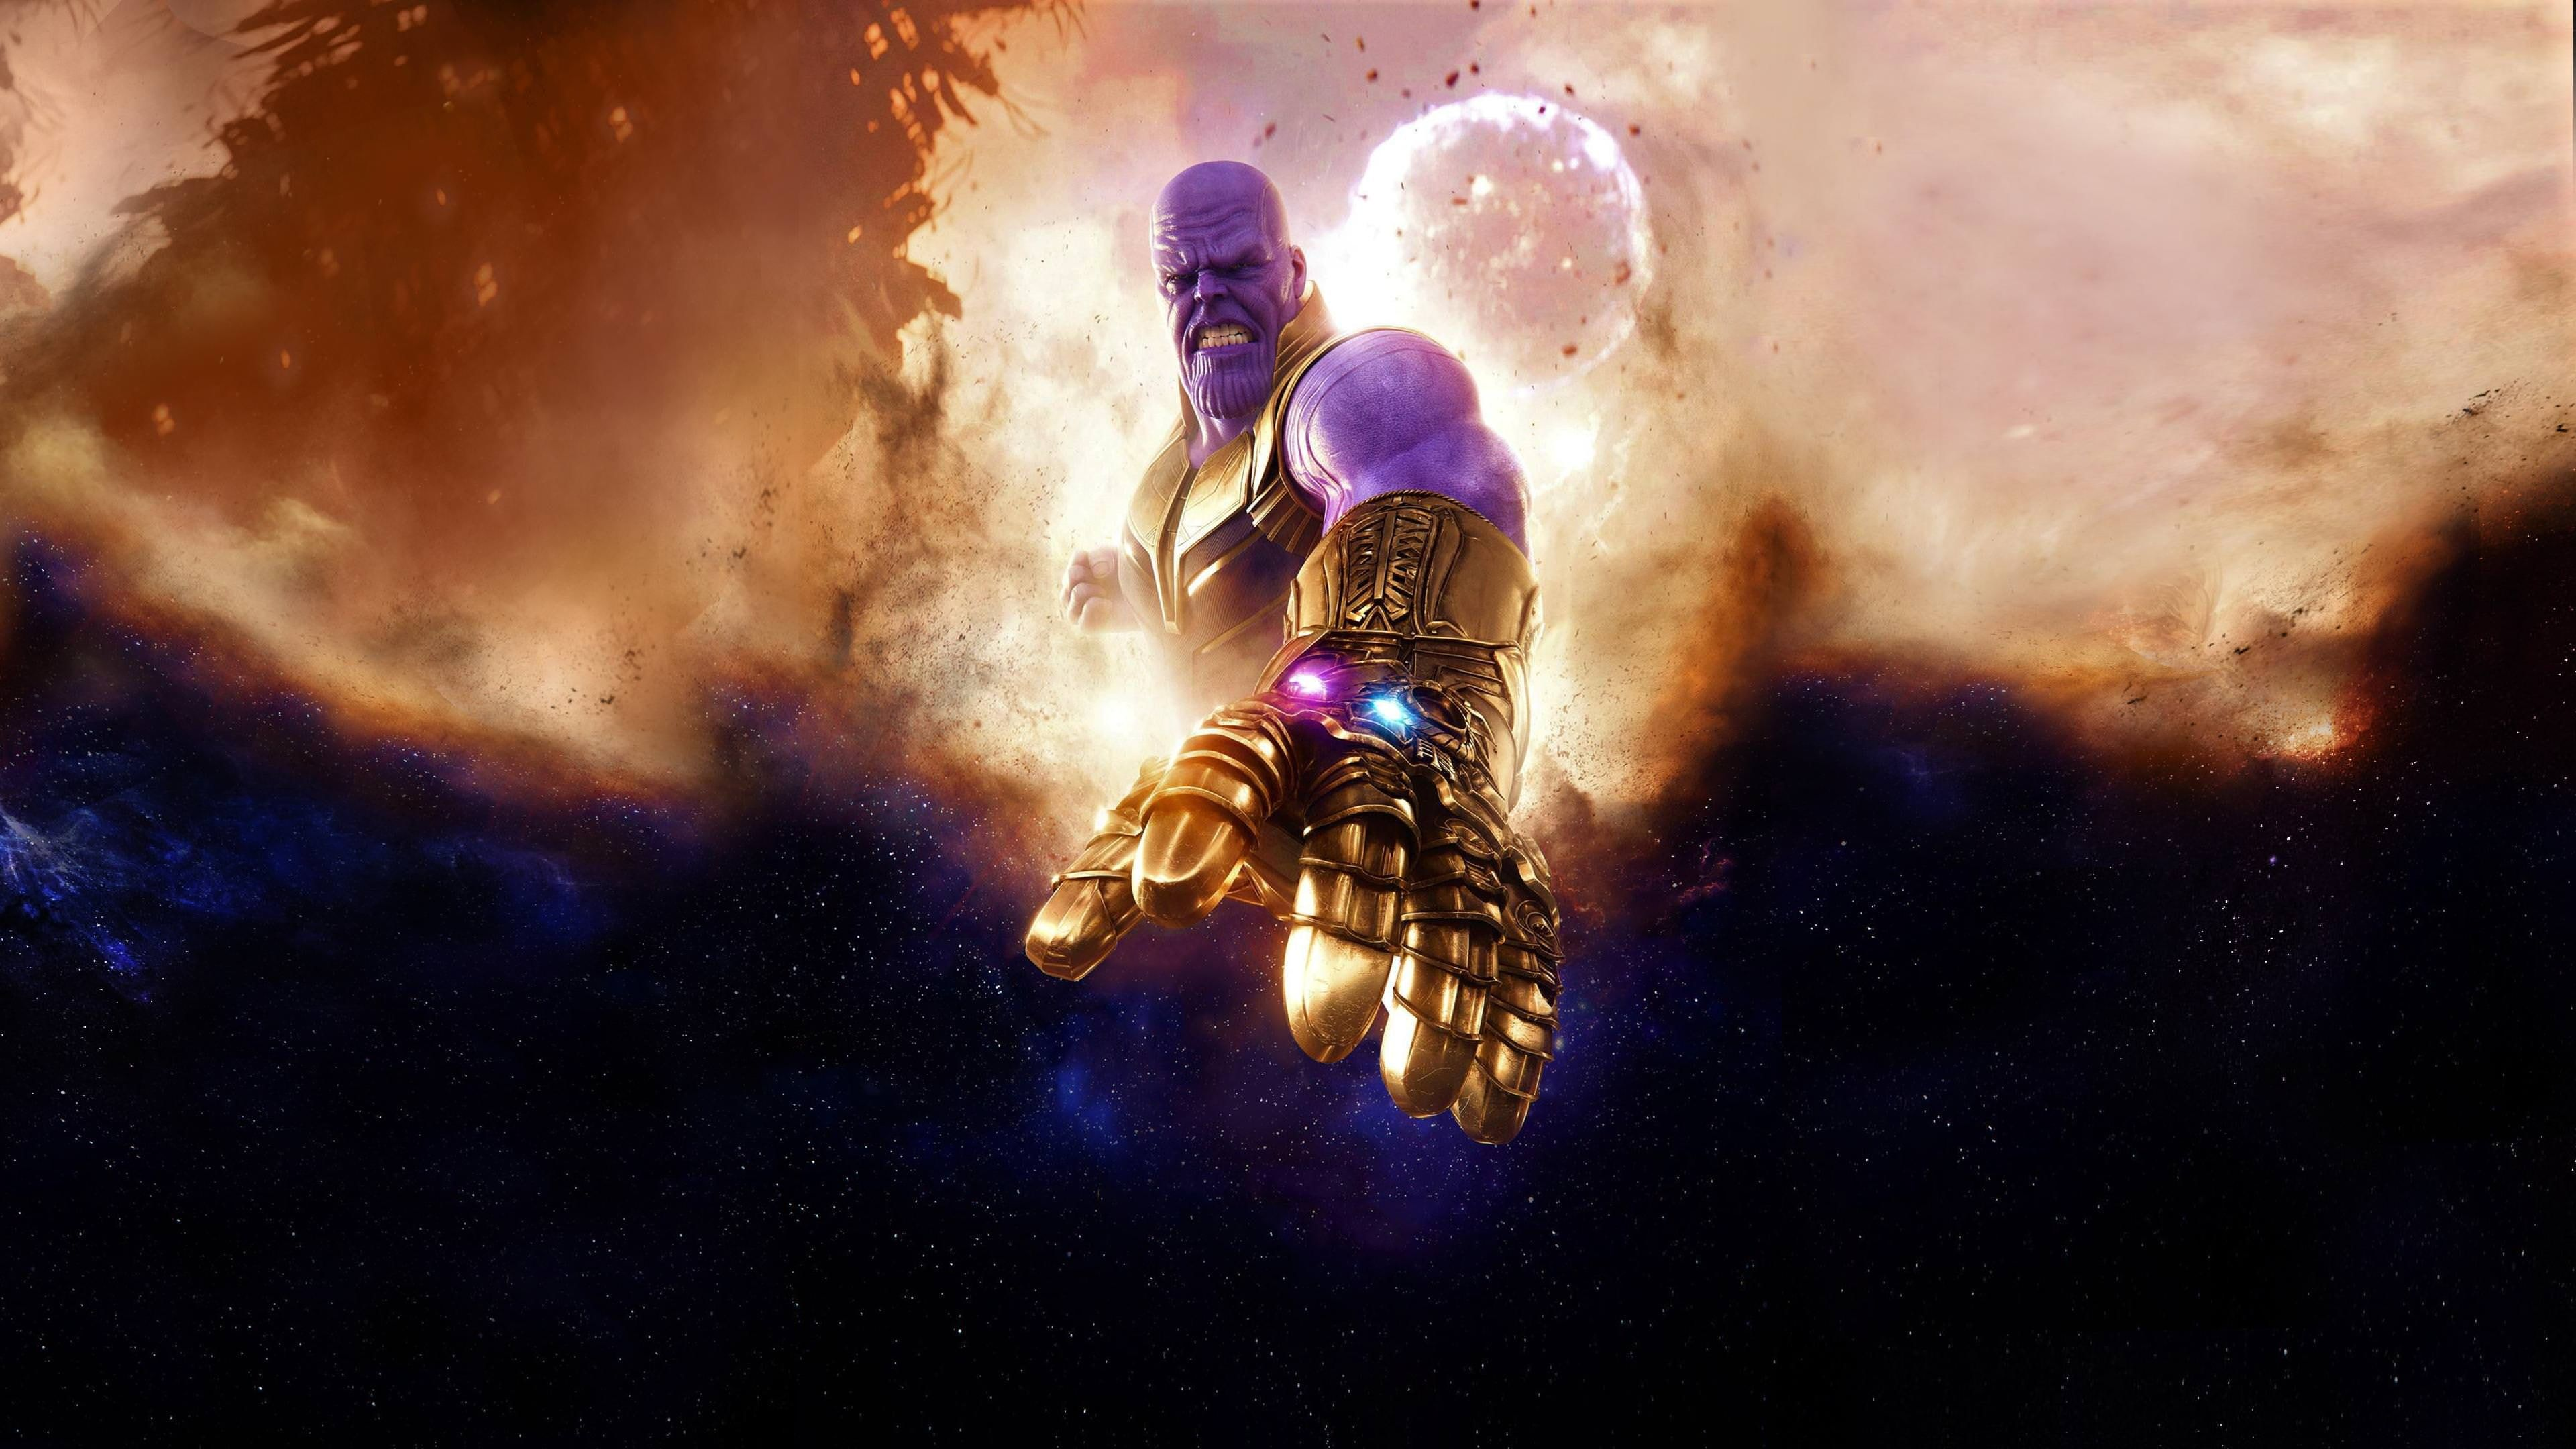 Avengers Infinity War Thanos 4k 4k Wallpaper Hdwallpaper